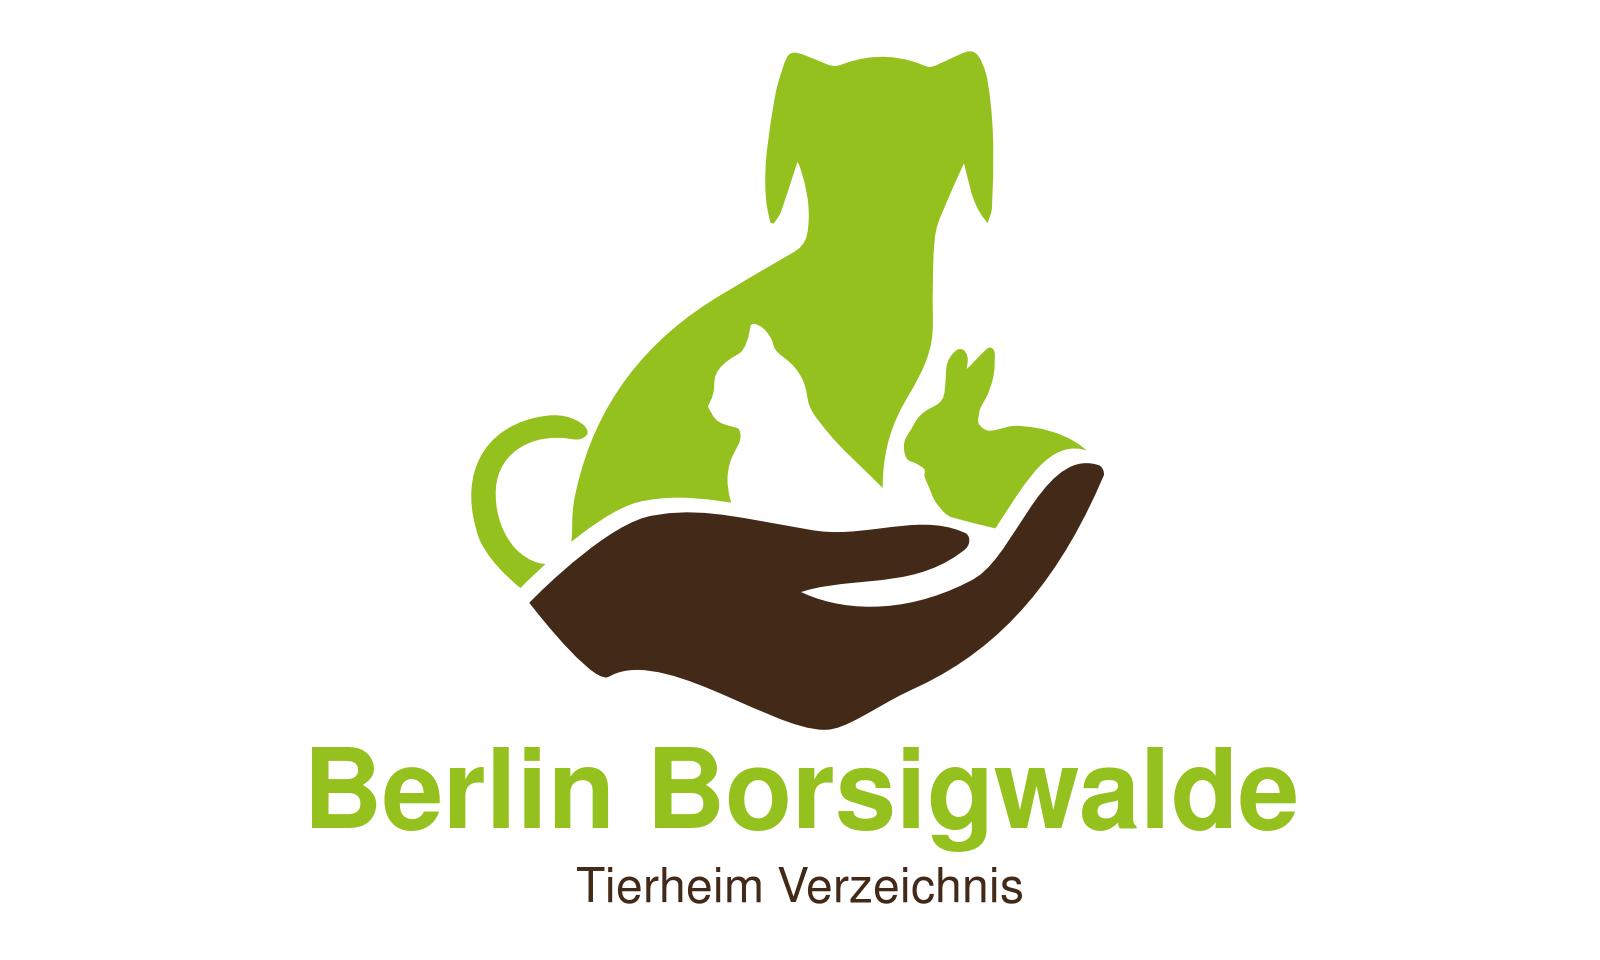 Tierheim Berlin Borsigwalde